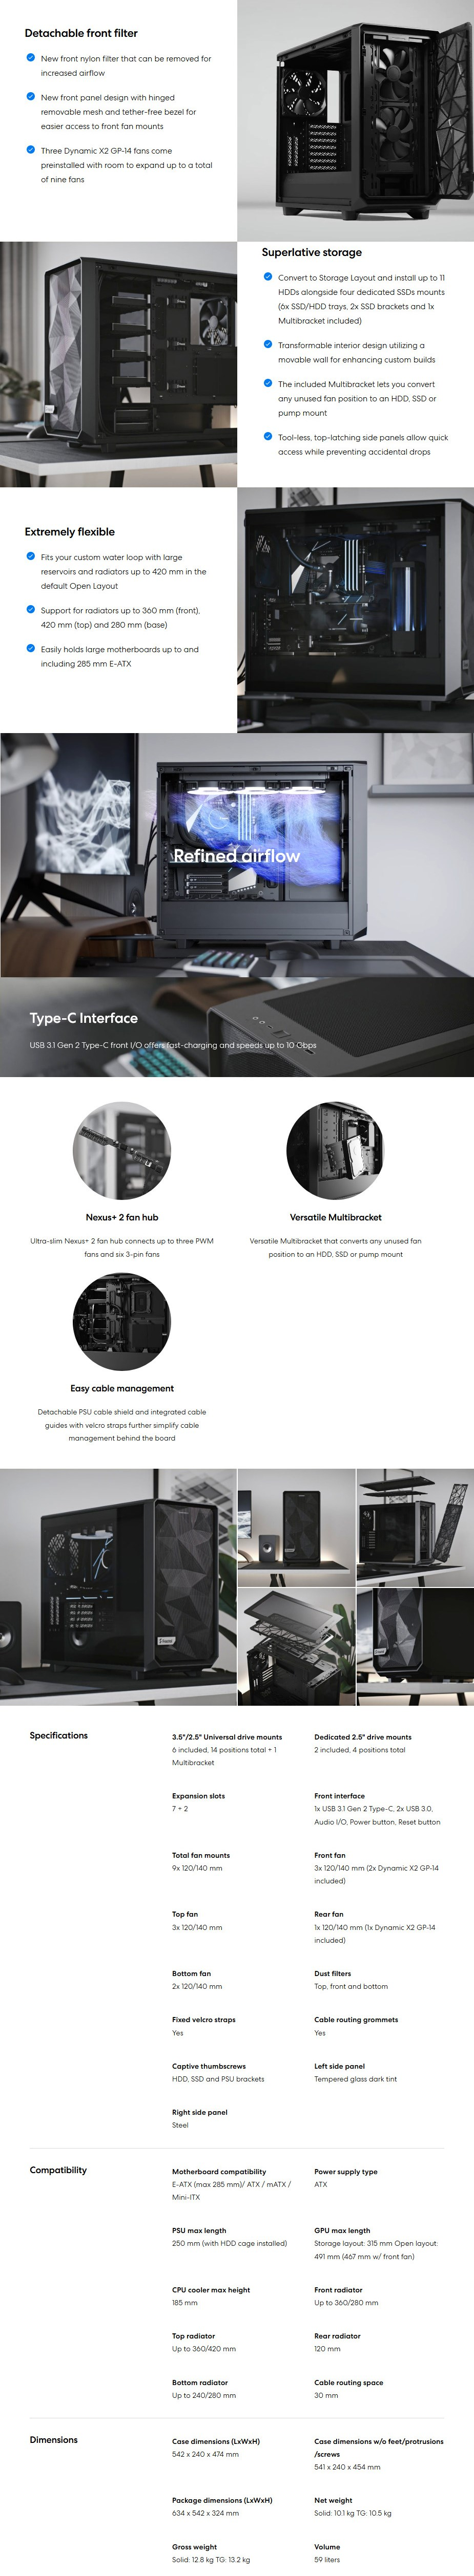 Fractal Design Meshify 2 TG Light Tint USB-C Mid-Tower E-ATX Case - Black - Overview 1